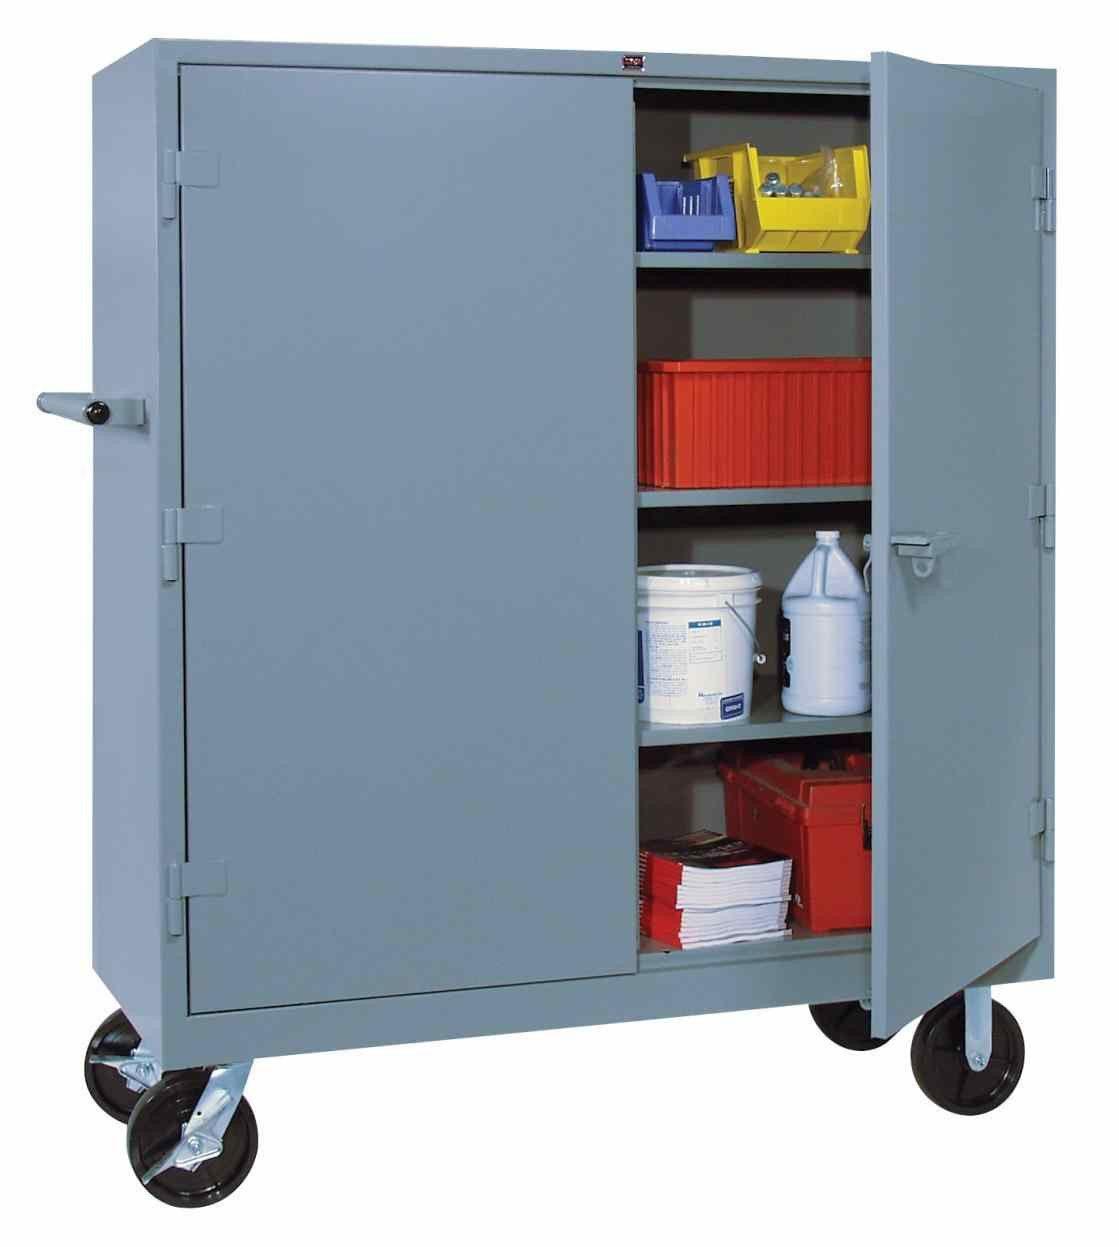 20 Mobile Garage Storage Cabinets Kitchen Floor Vinyl Ideas Check More At Http